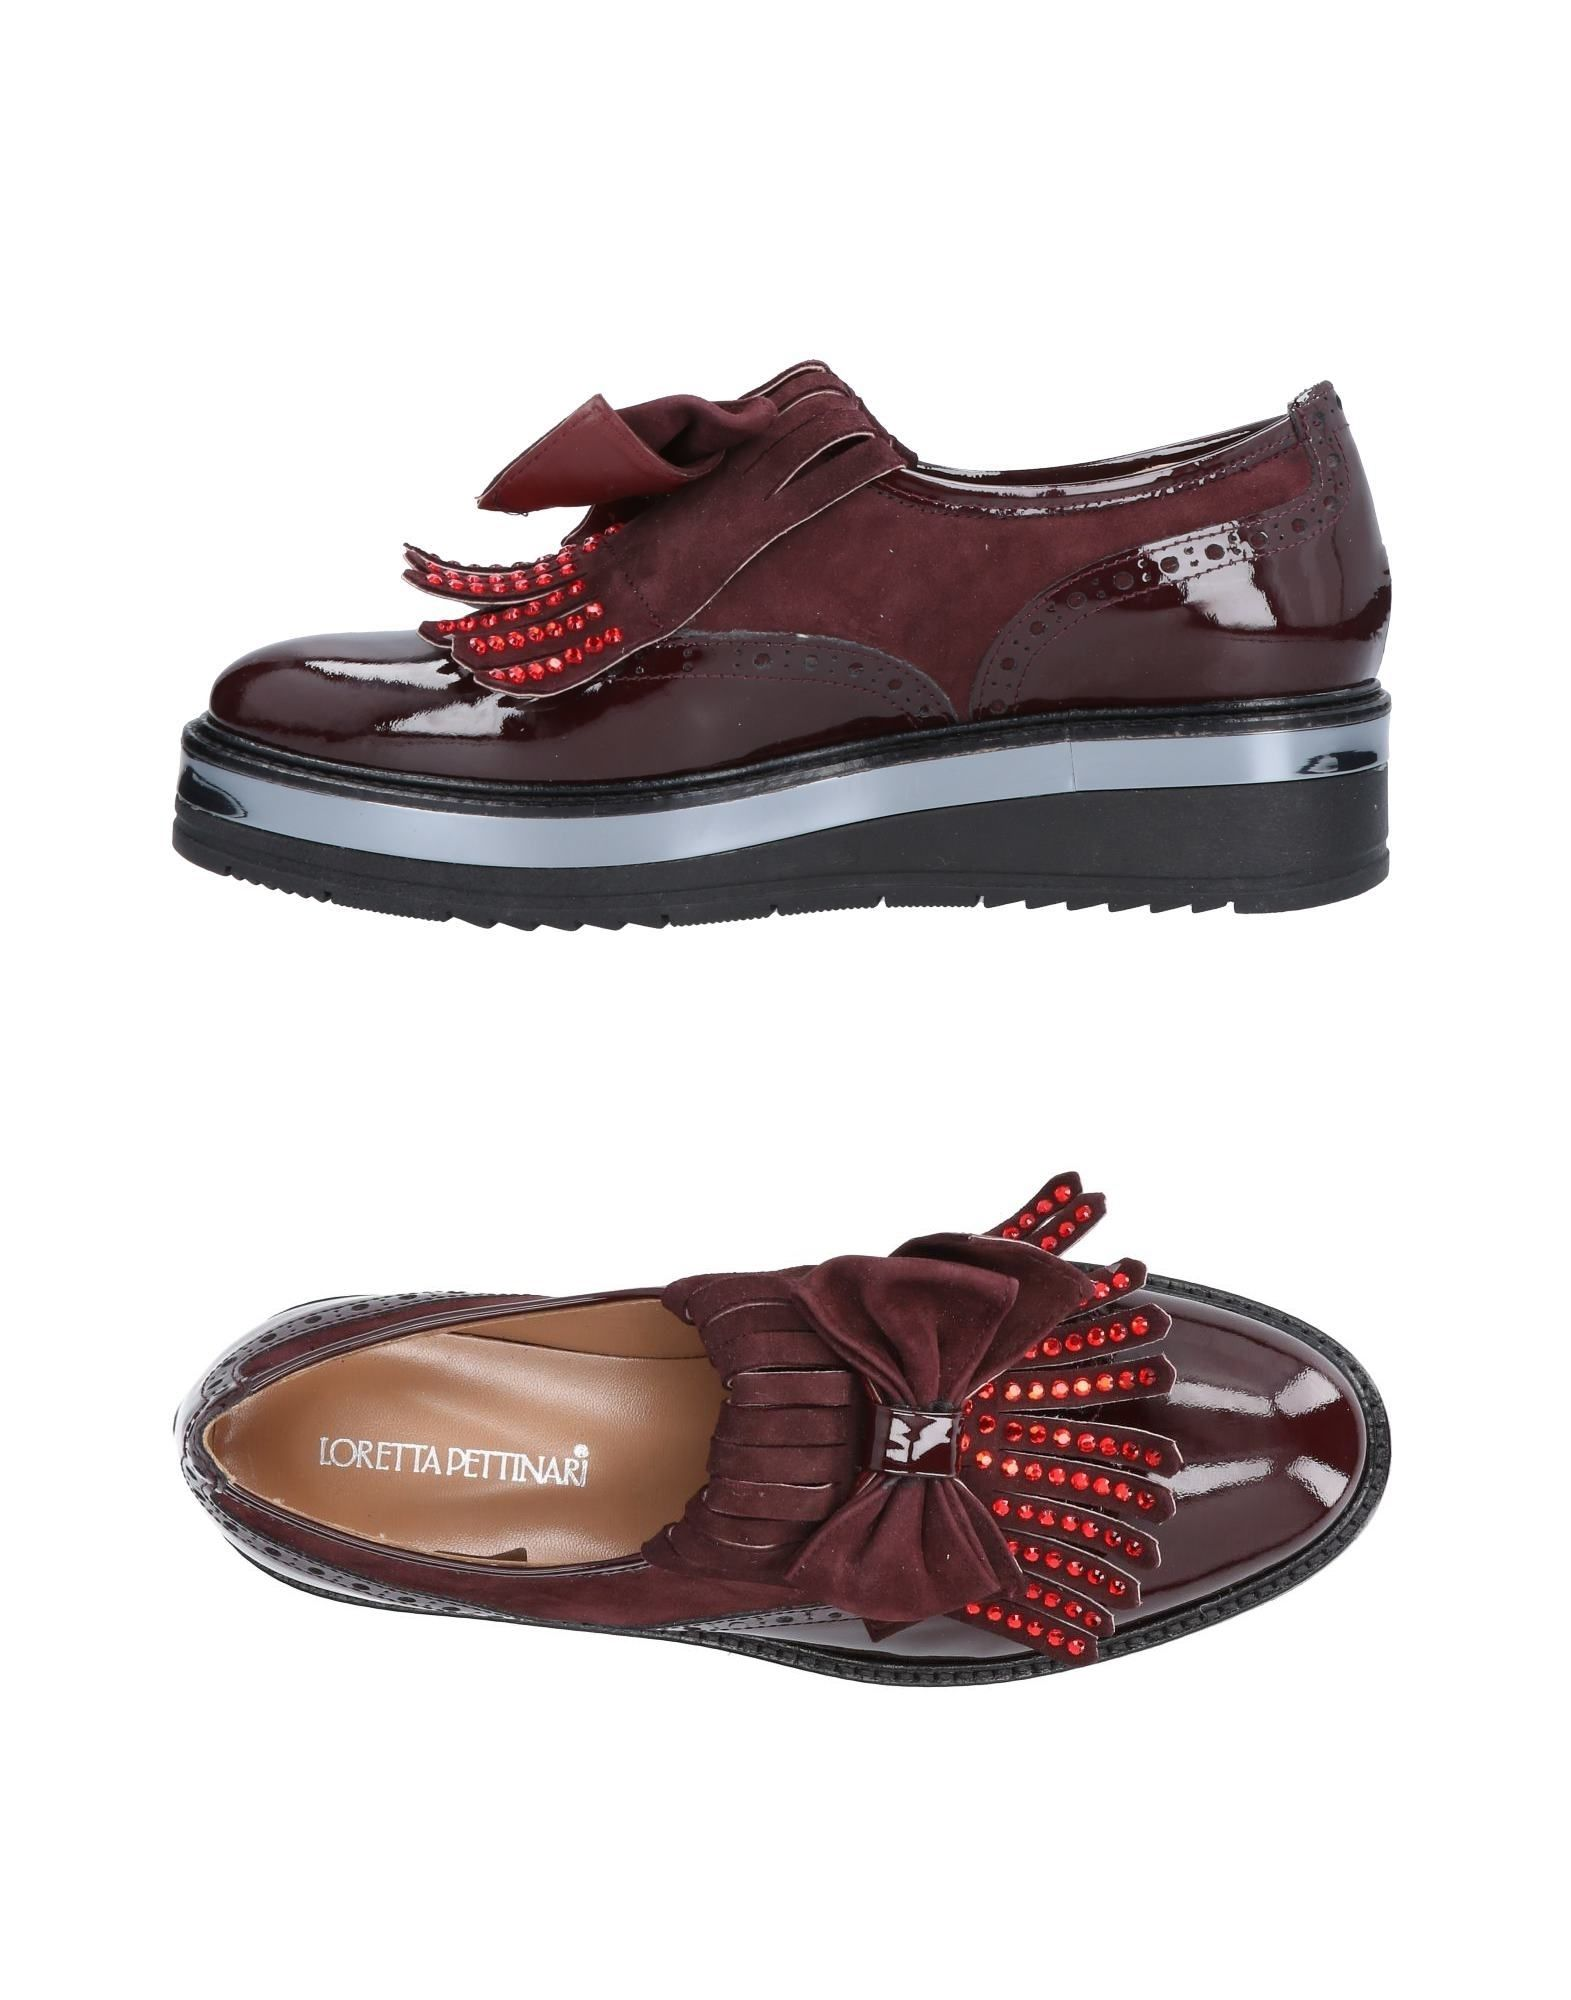 Loretta Pettinari Mokassins Damen  11471815GHGut aussehende strapazierfähige Schuhe